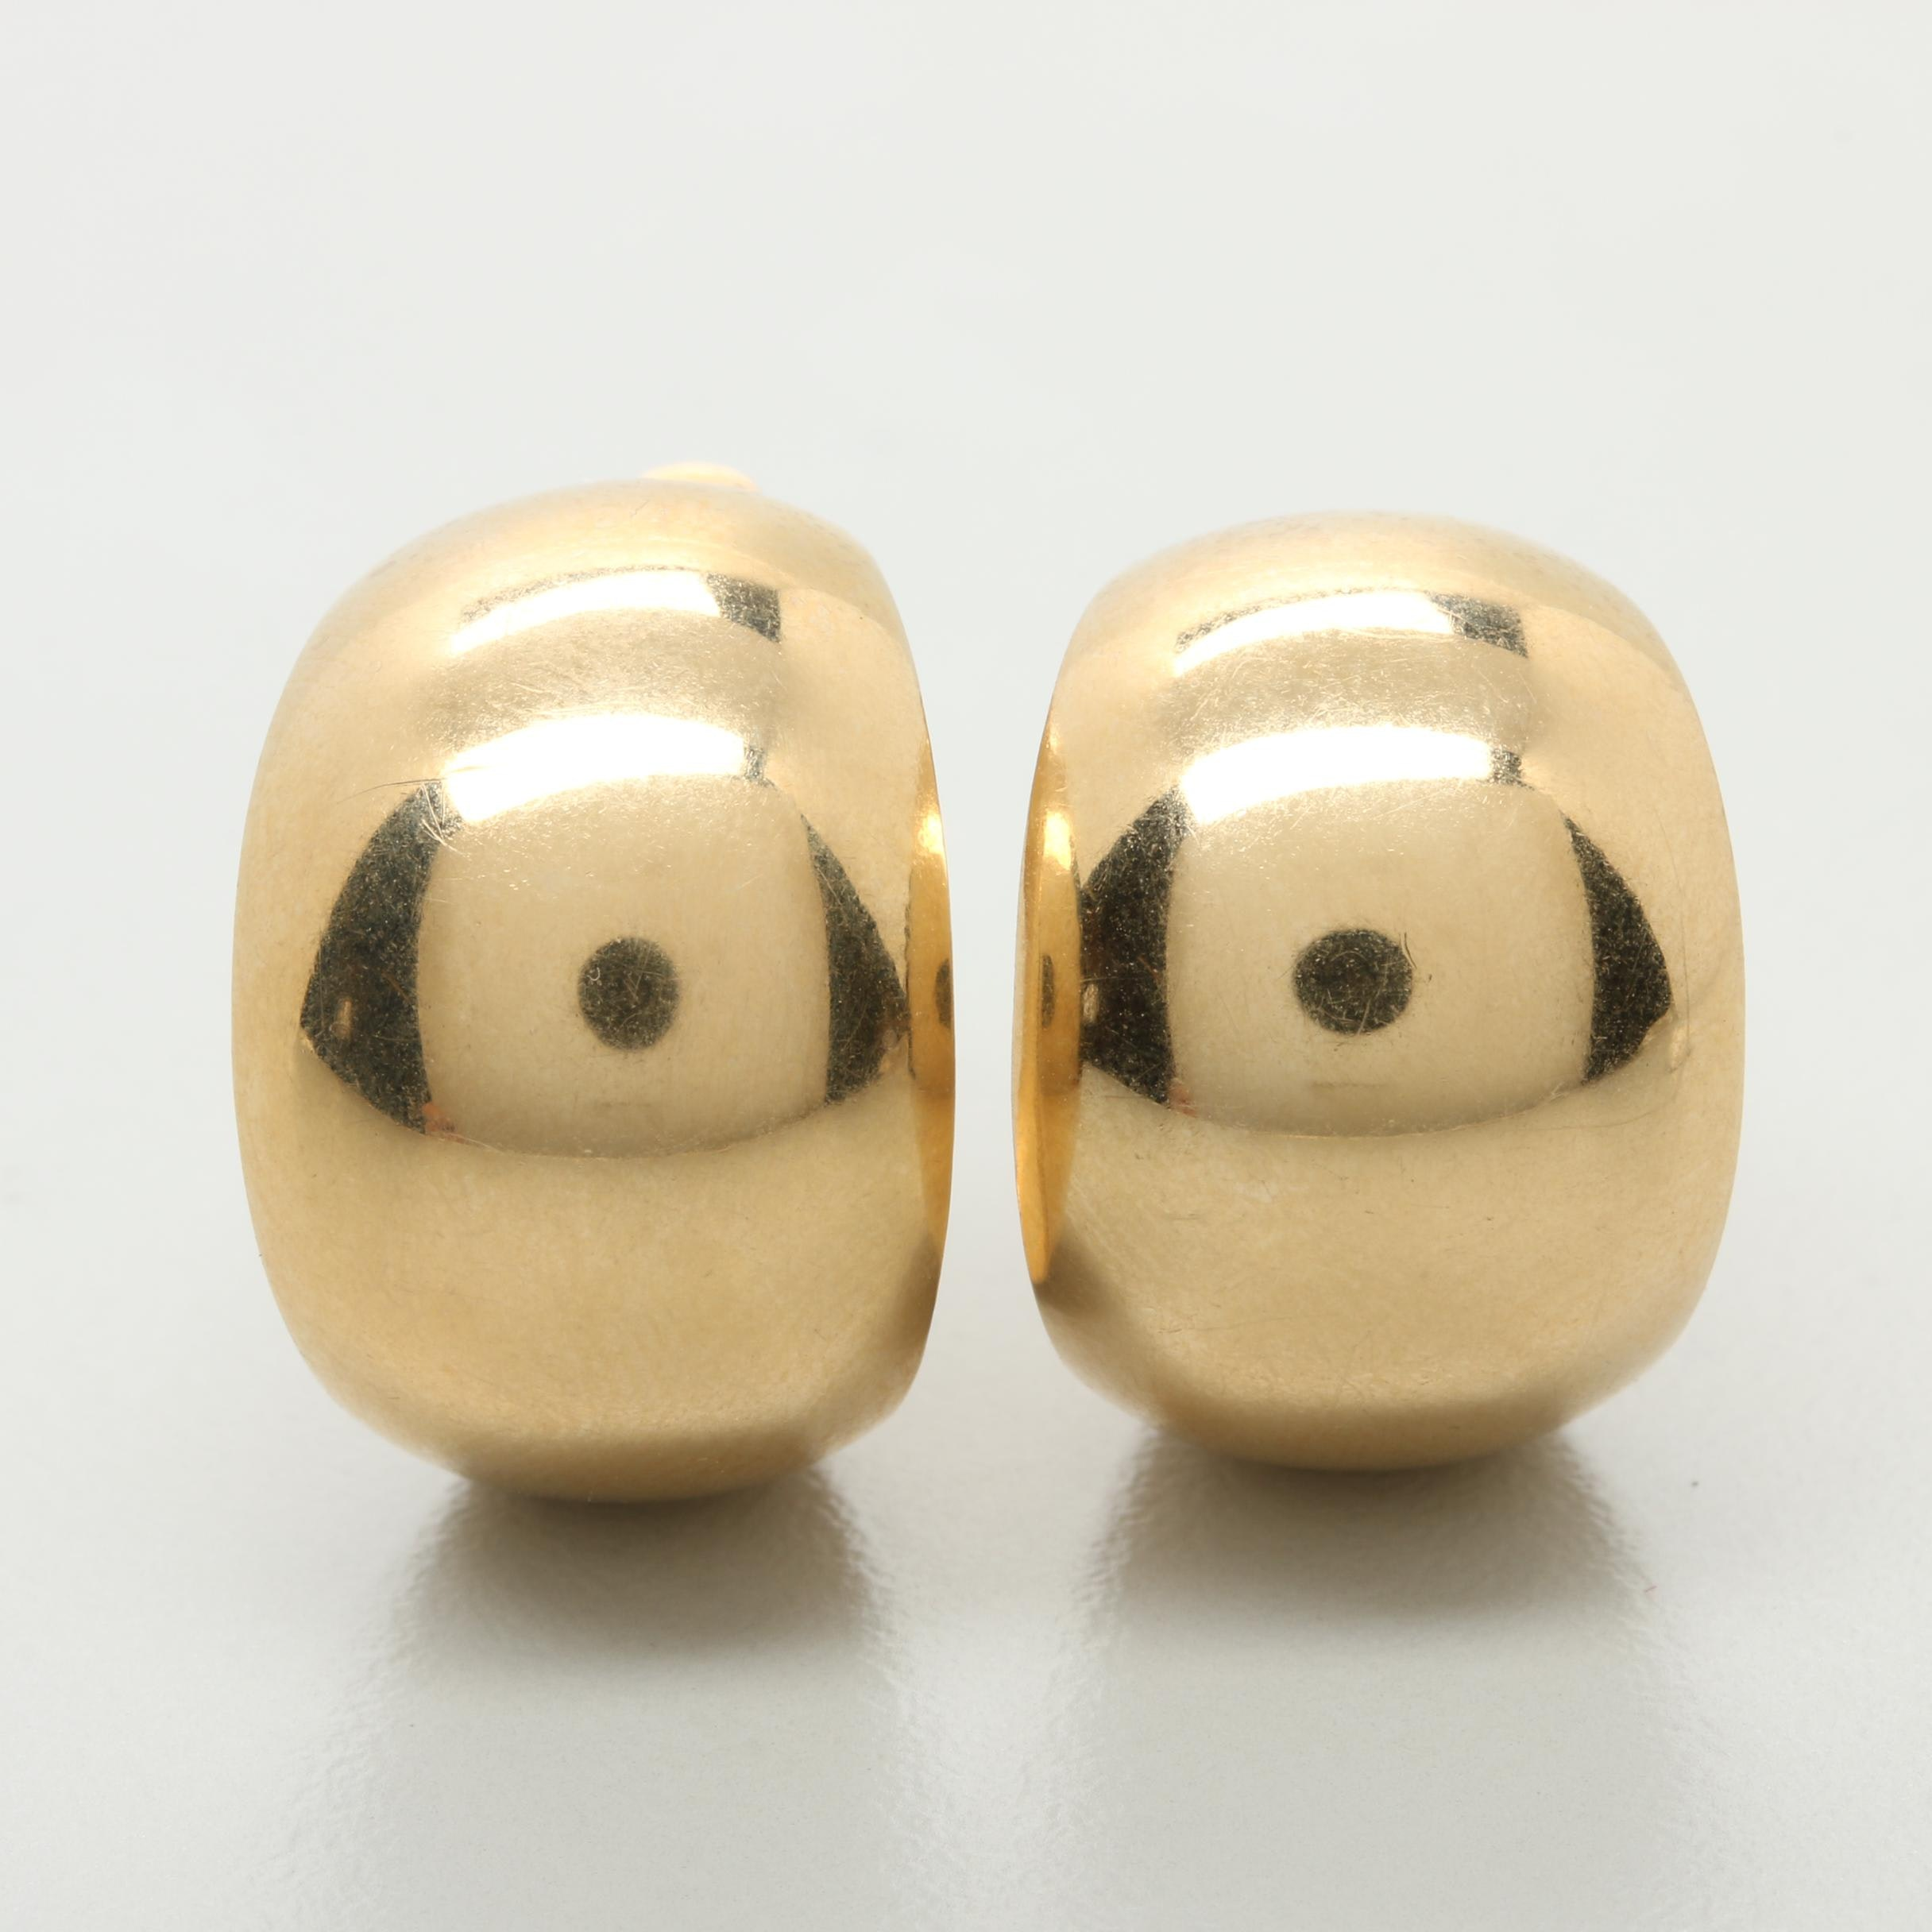 14K Yellow Gold C-Hoop Earring Jackets